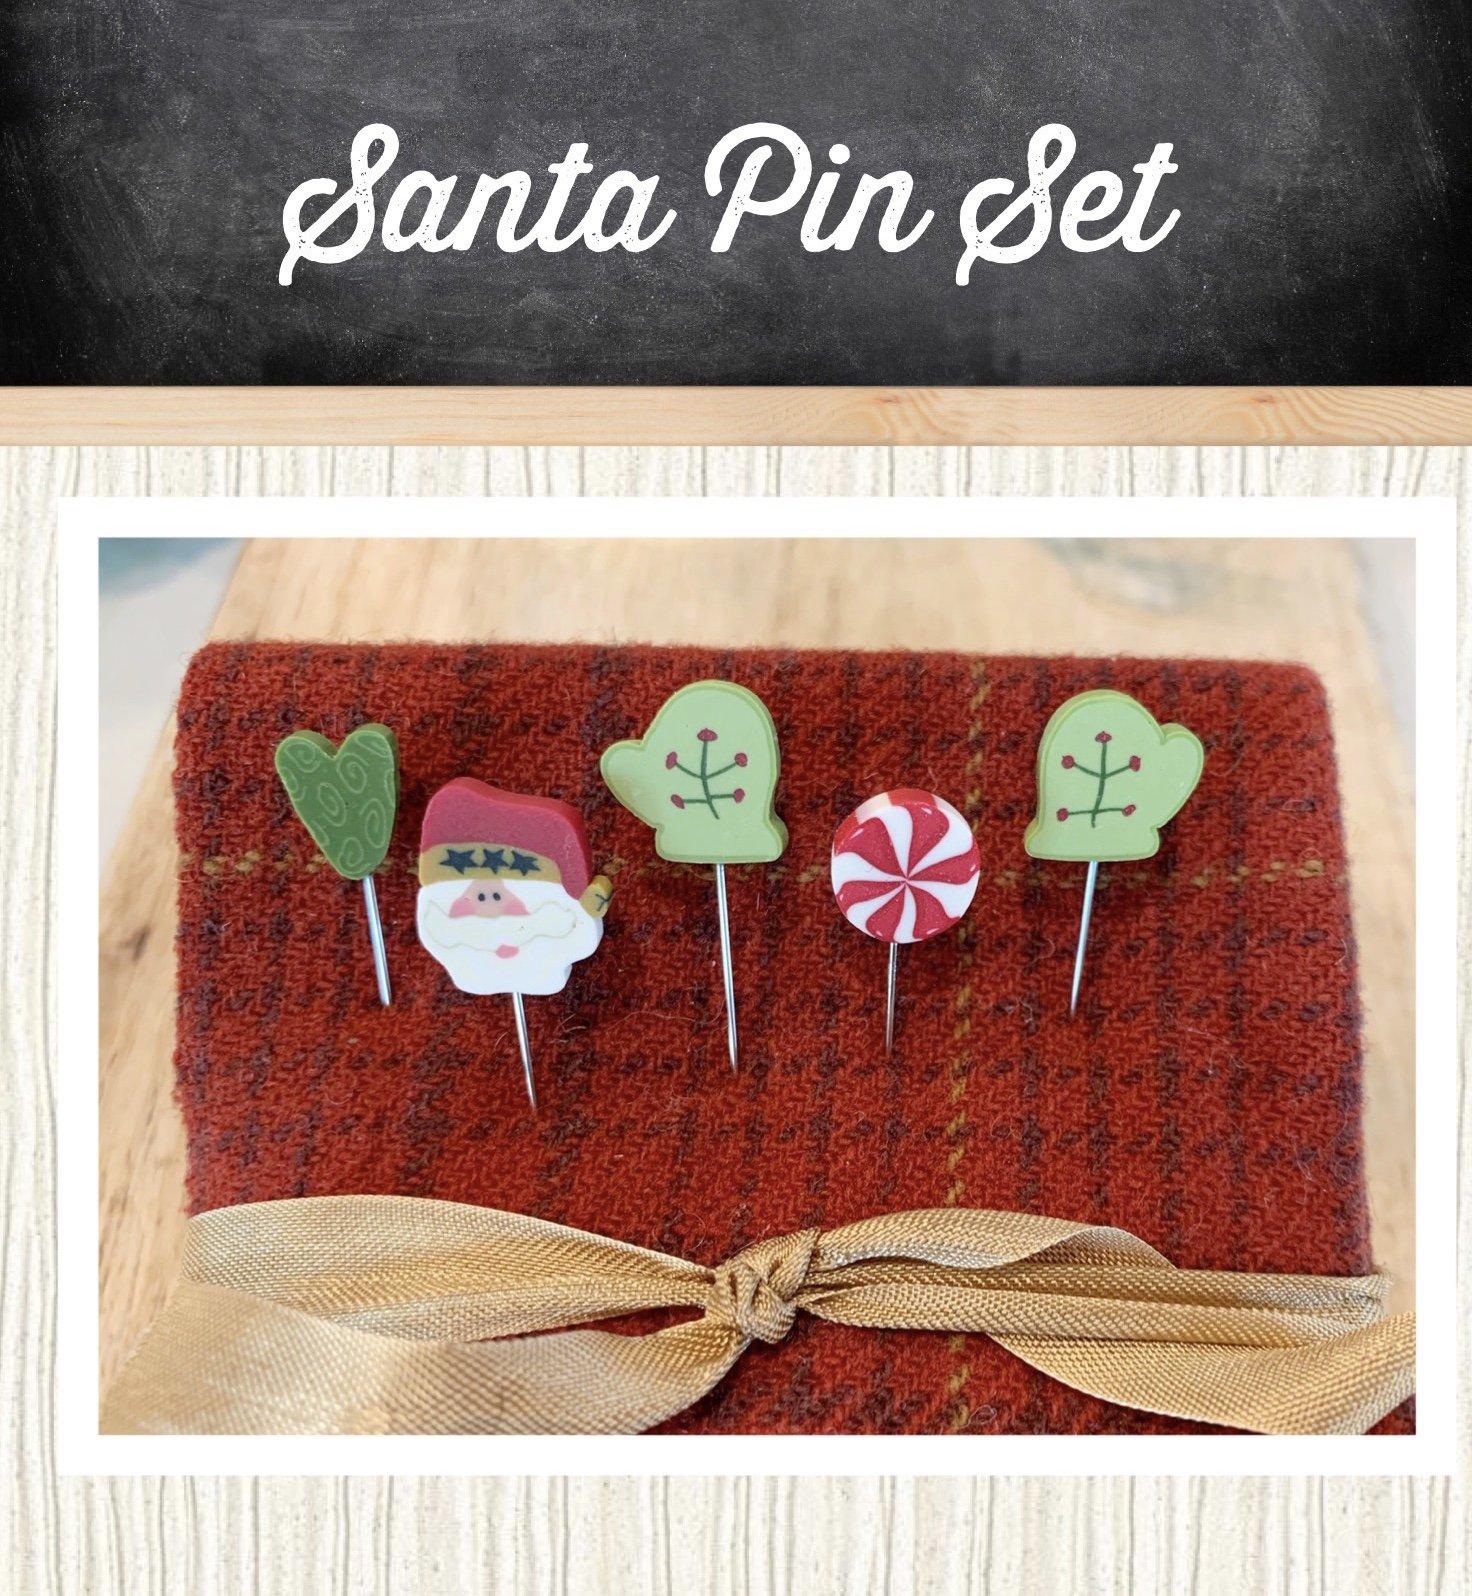 Santa Pin Set * Handmade